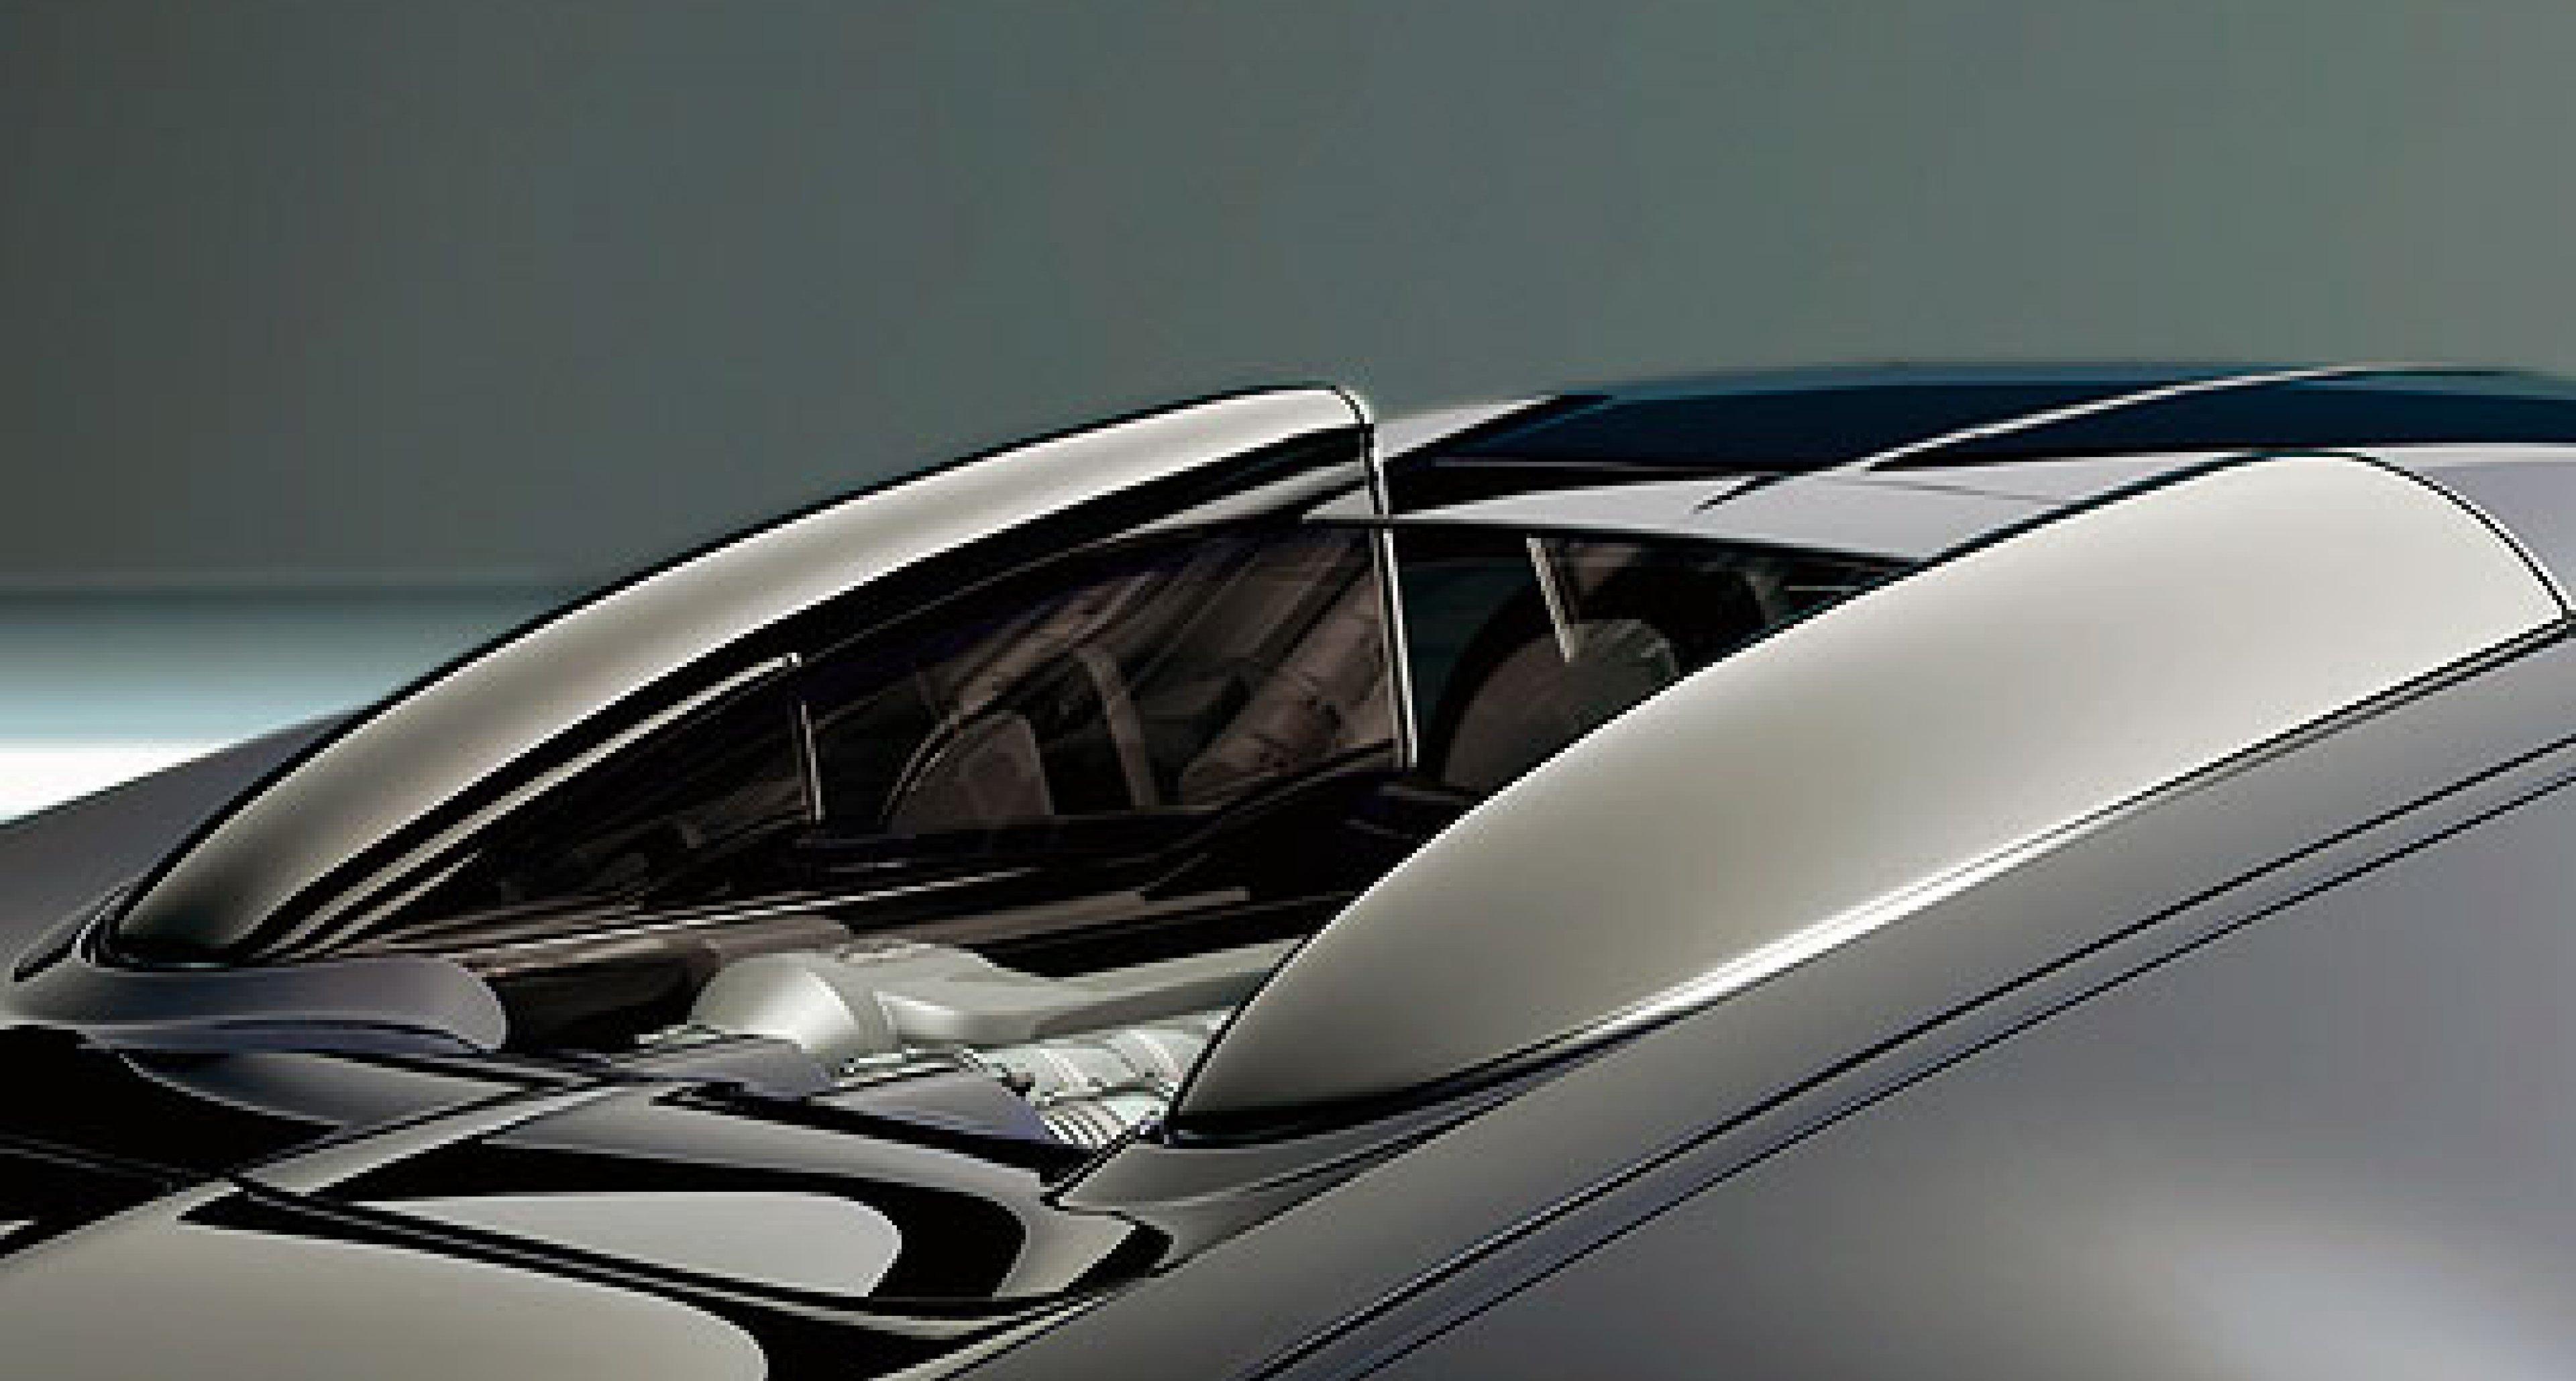 Bugatti Veyron 16.4 – Safety First